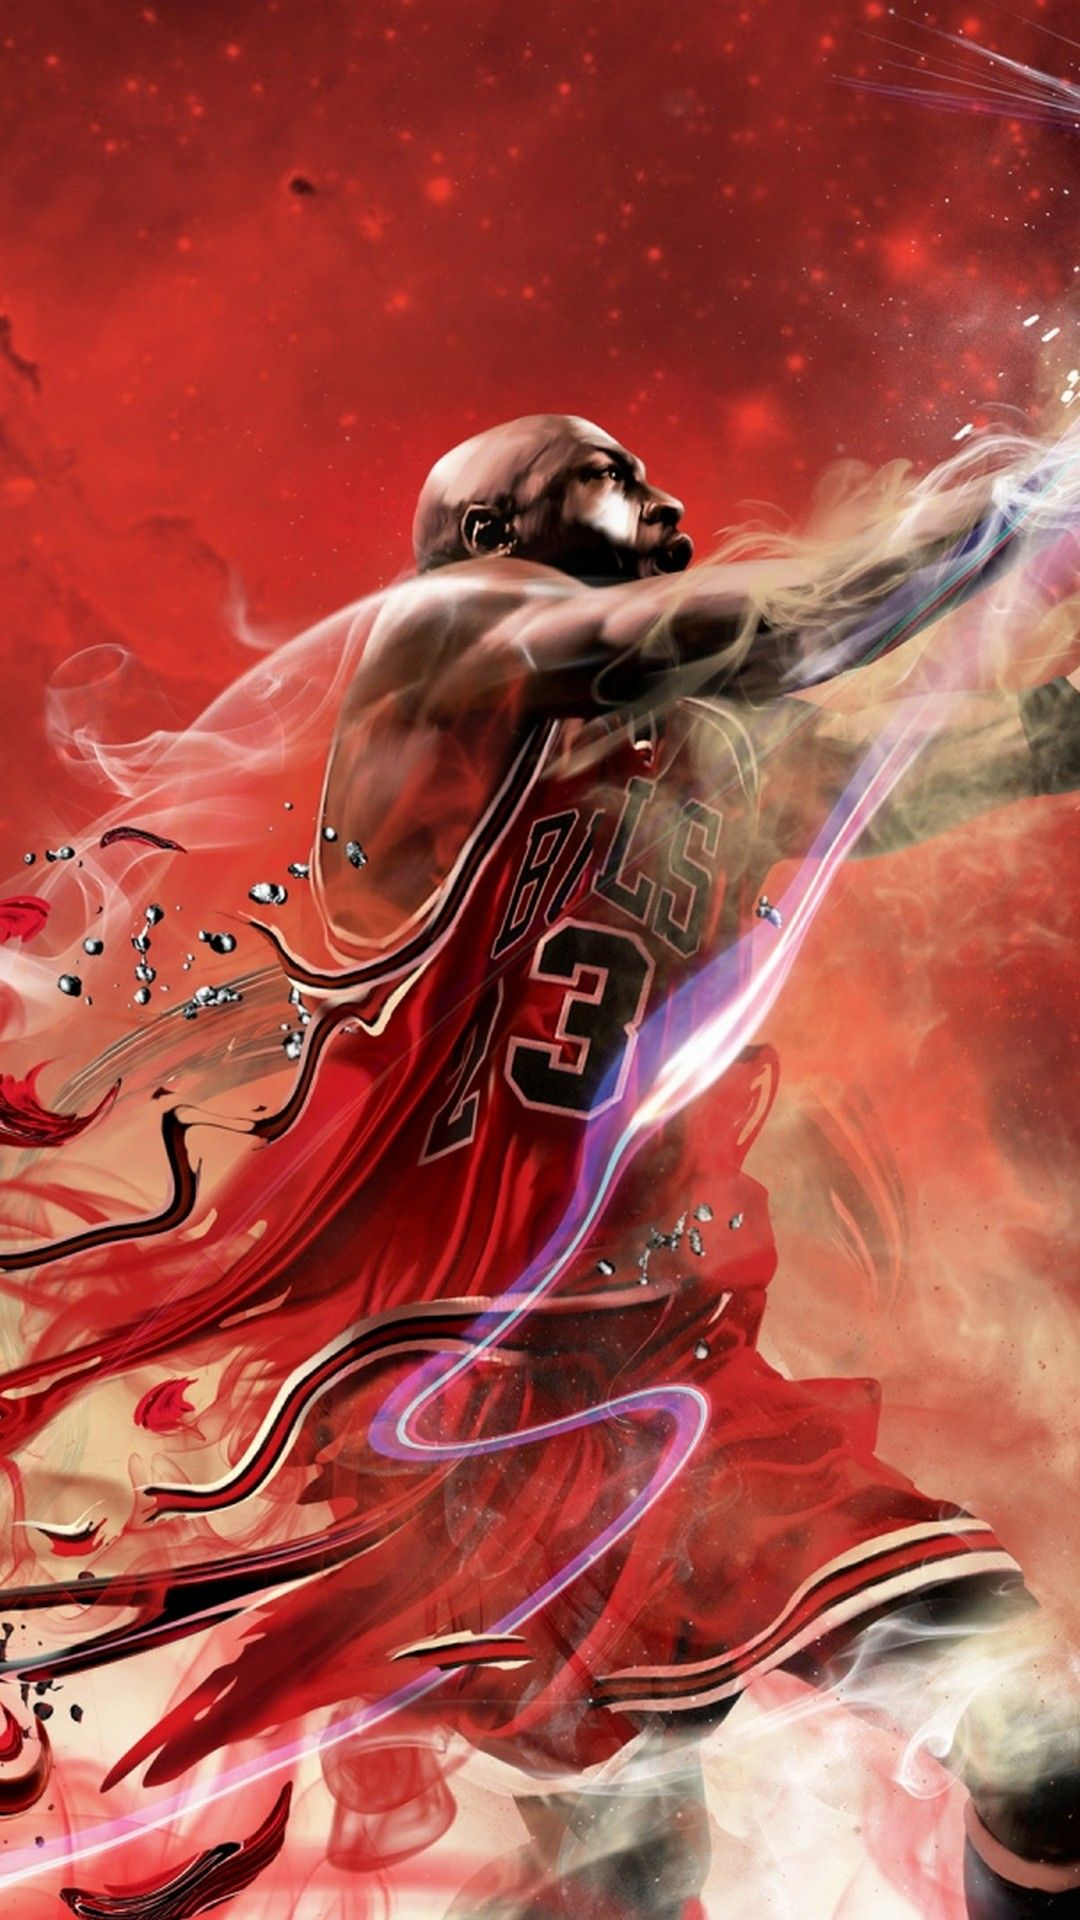 iPhone Wallpaper HD NBA Basketball Basketball iphone